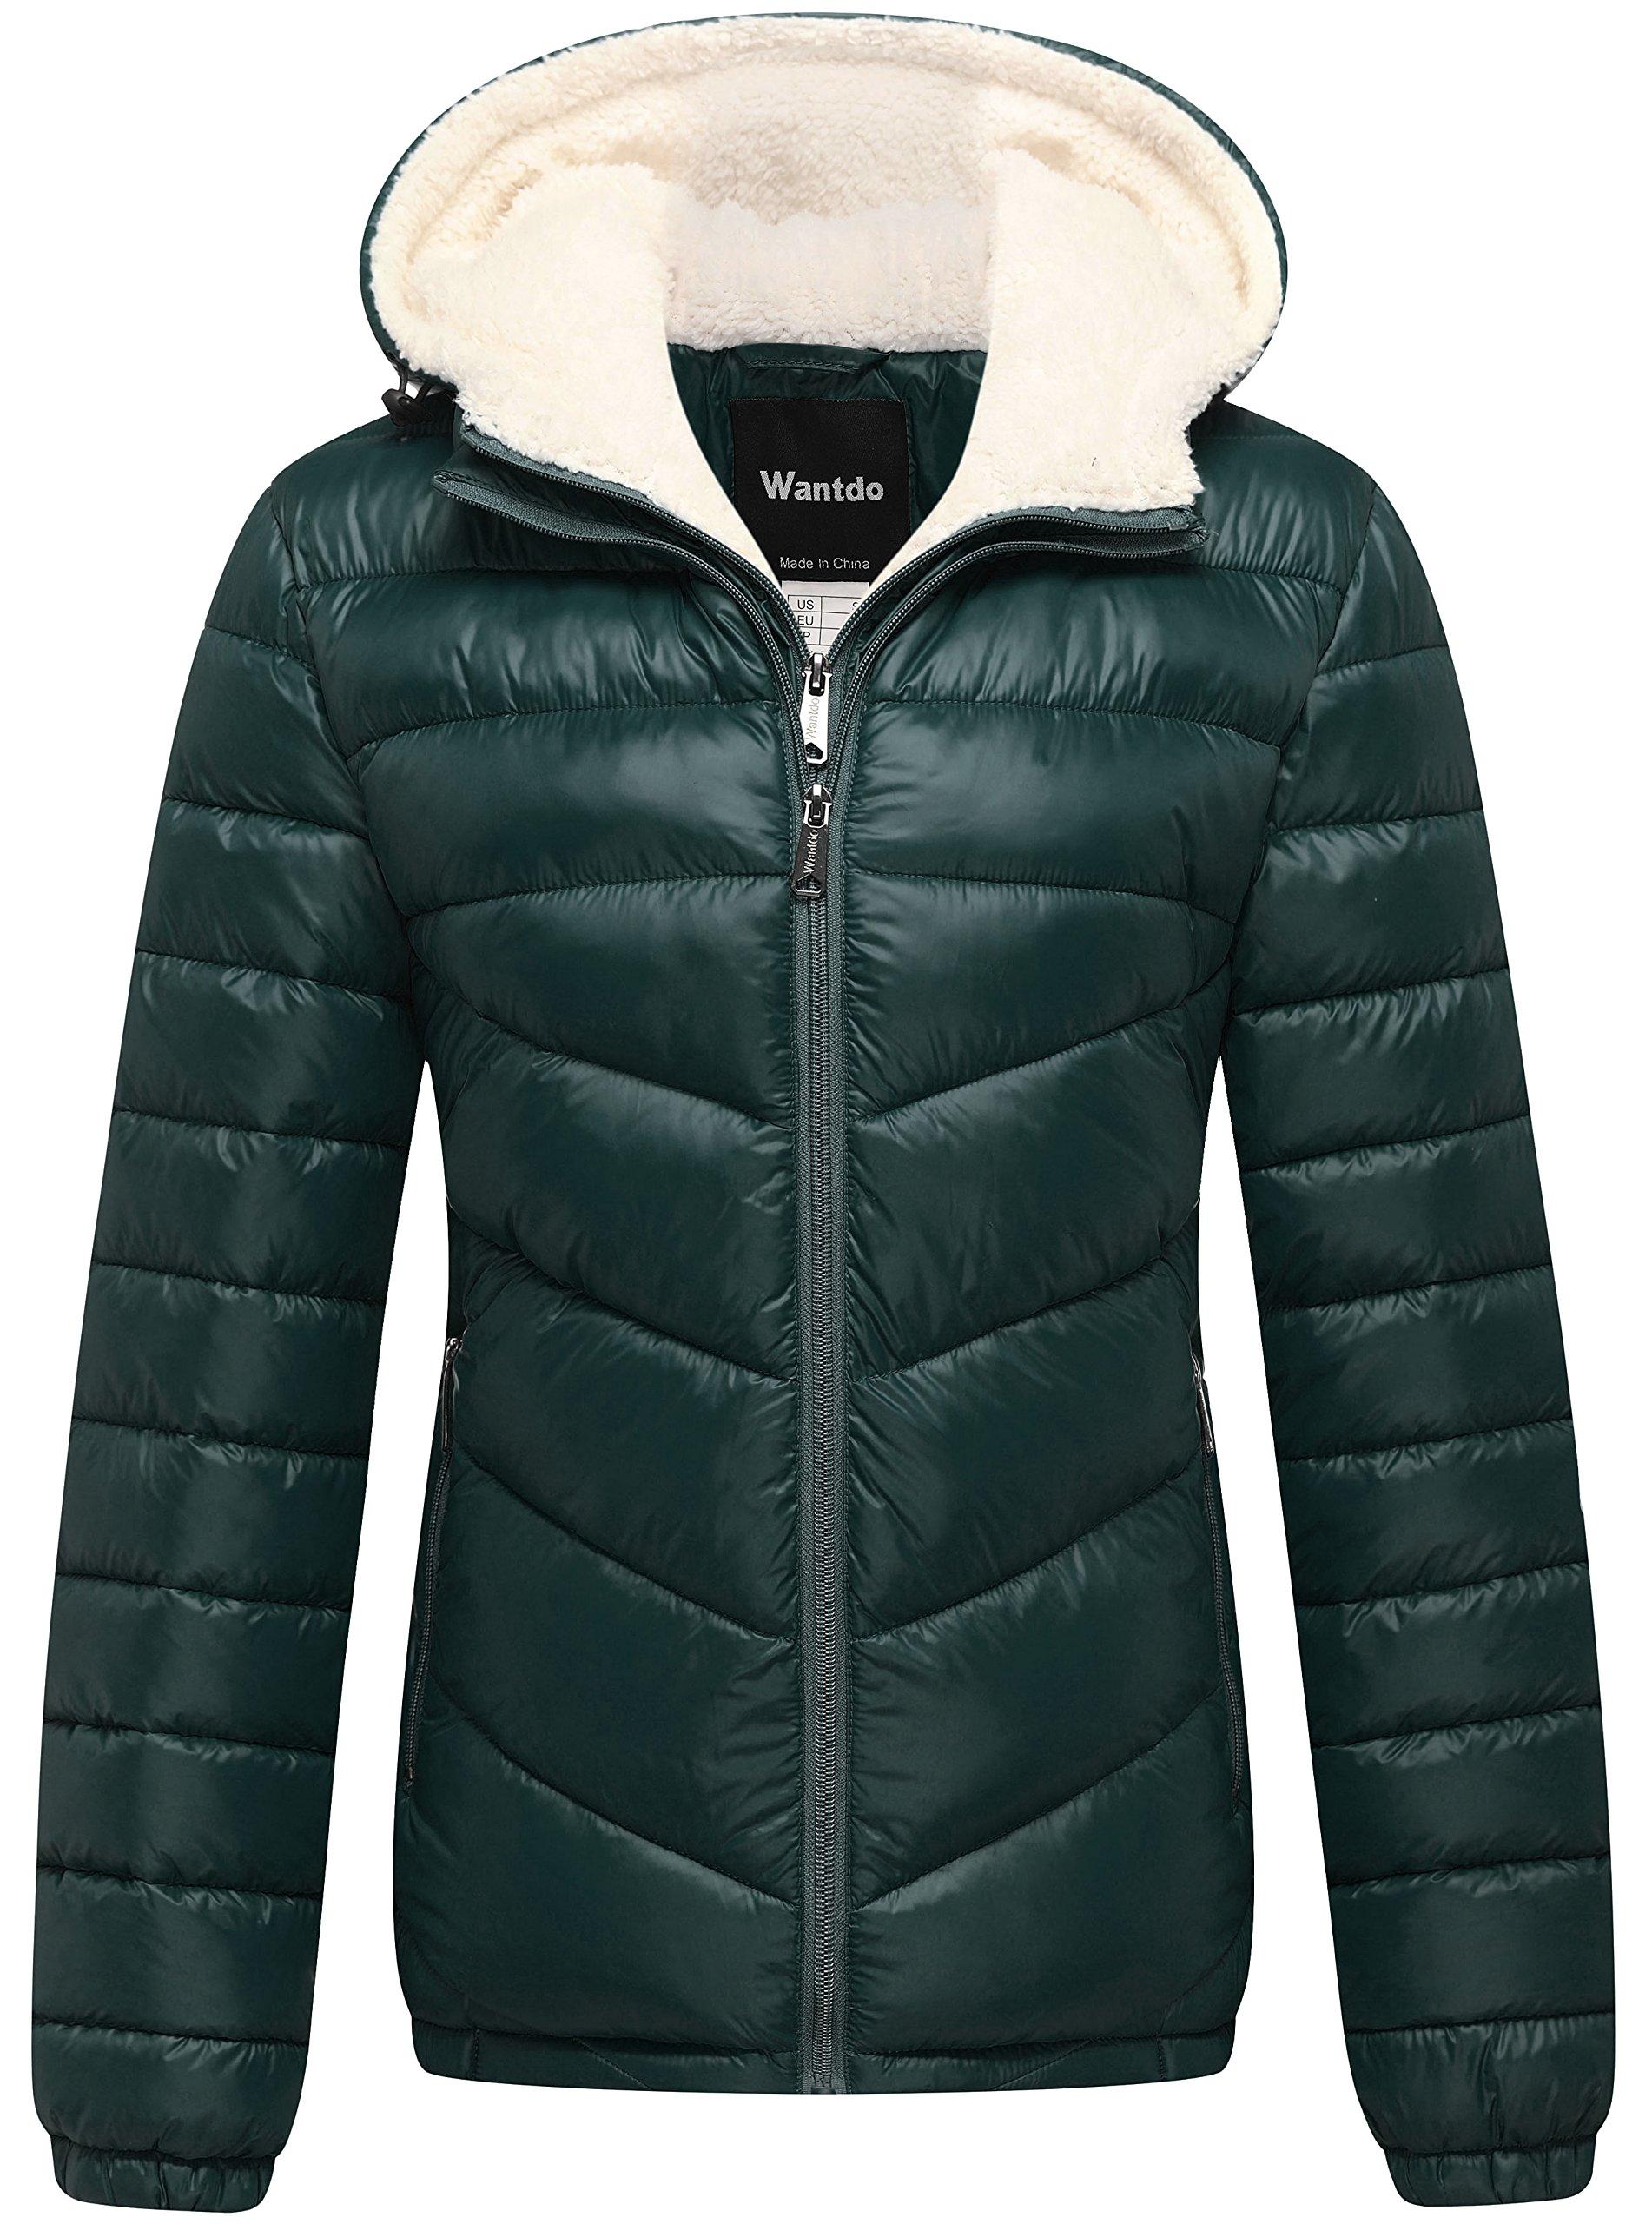 Wantdo Women's Winter Hooded Thick Puffer Jacket US Medium Green